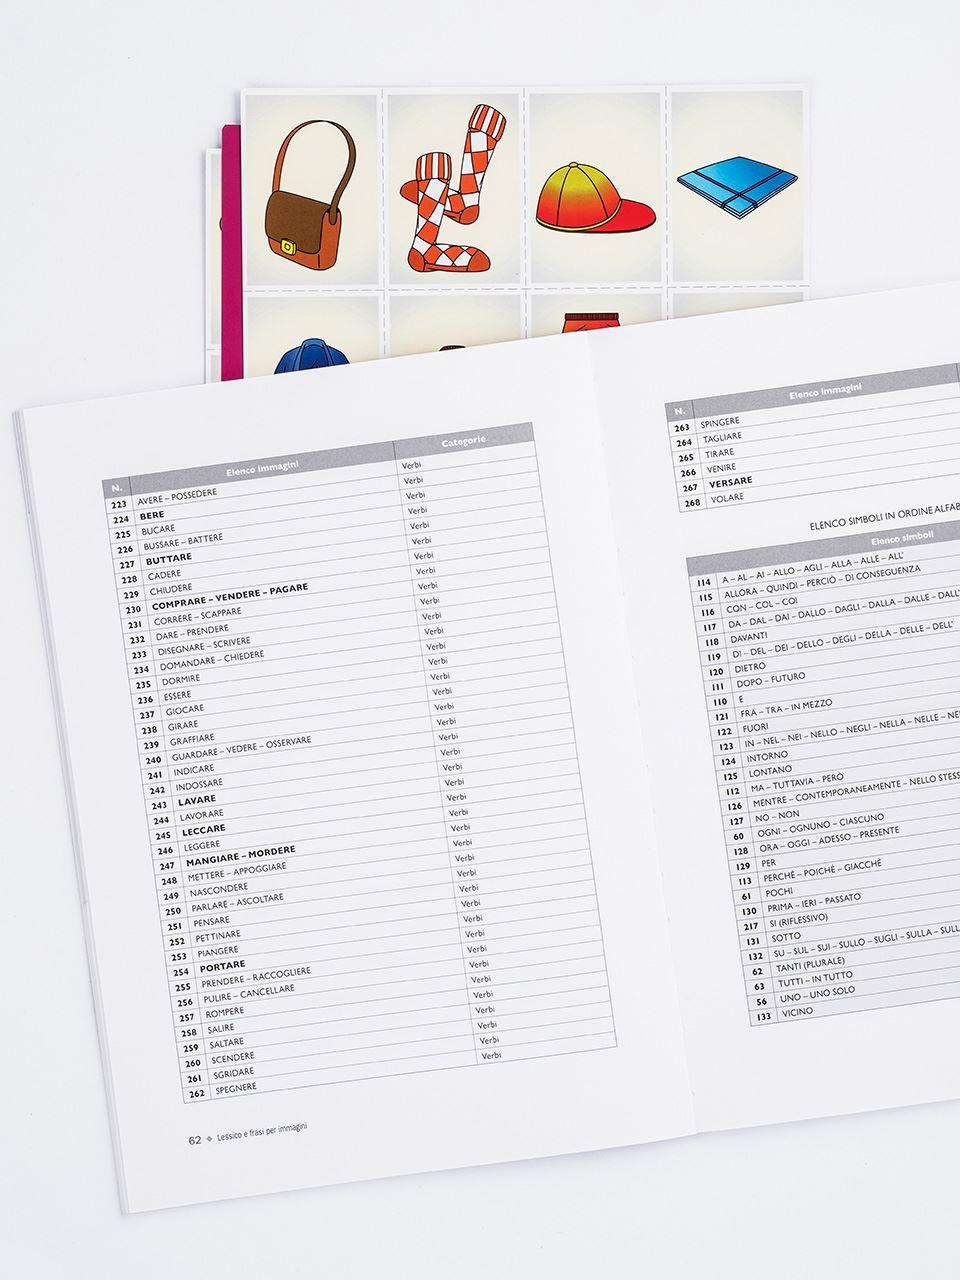 Lessico e frasi per immagini - Libri - Erickson 2